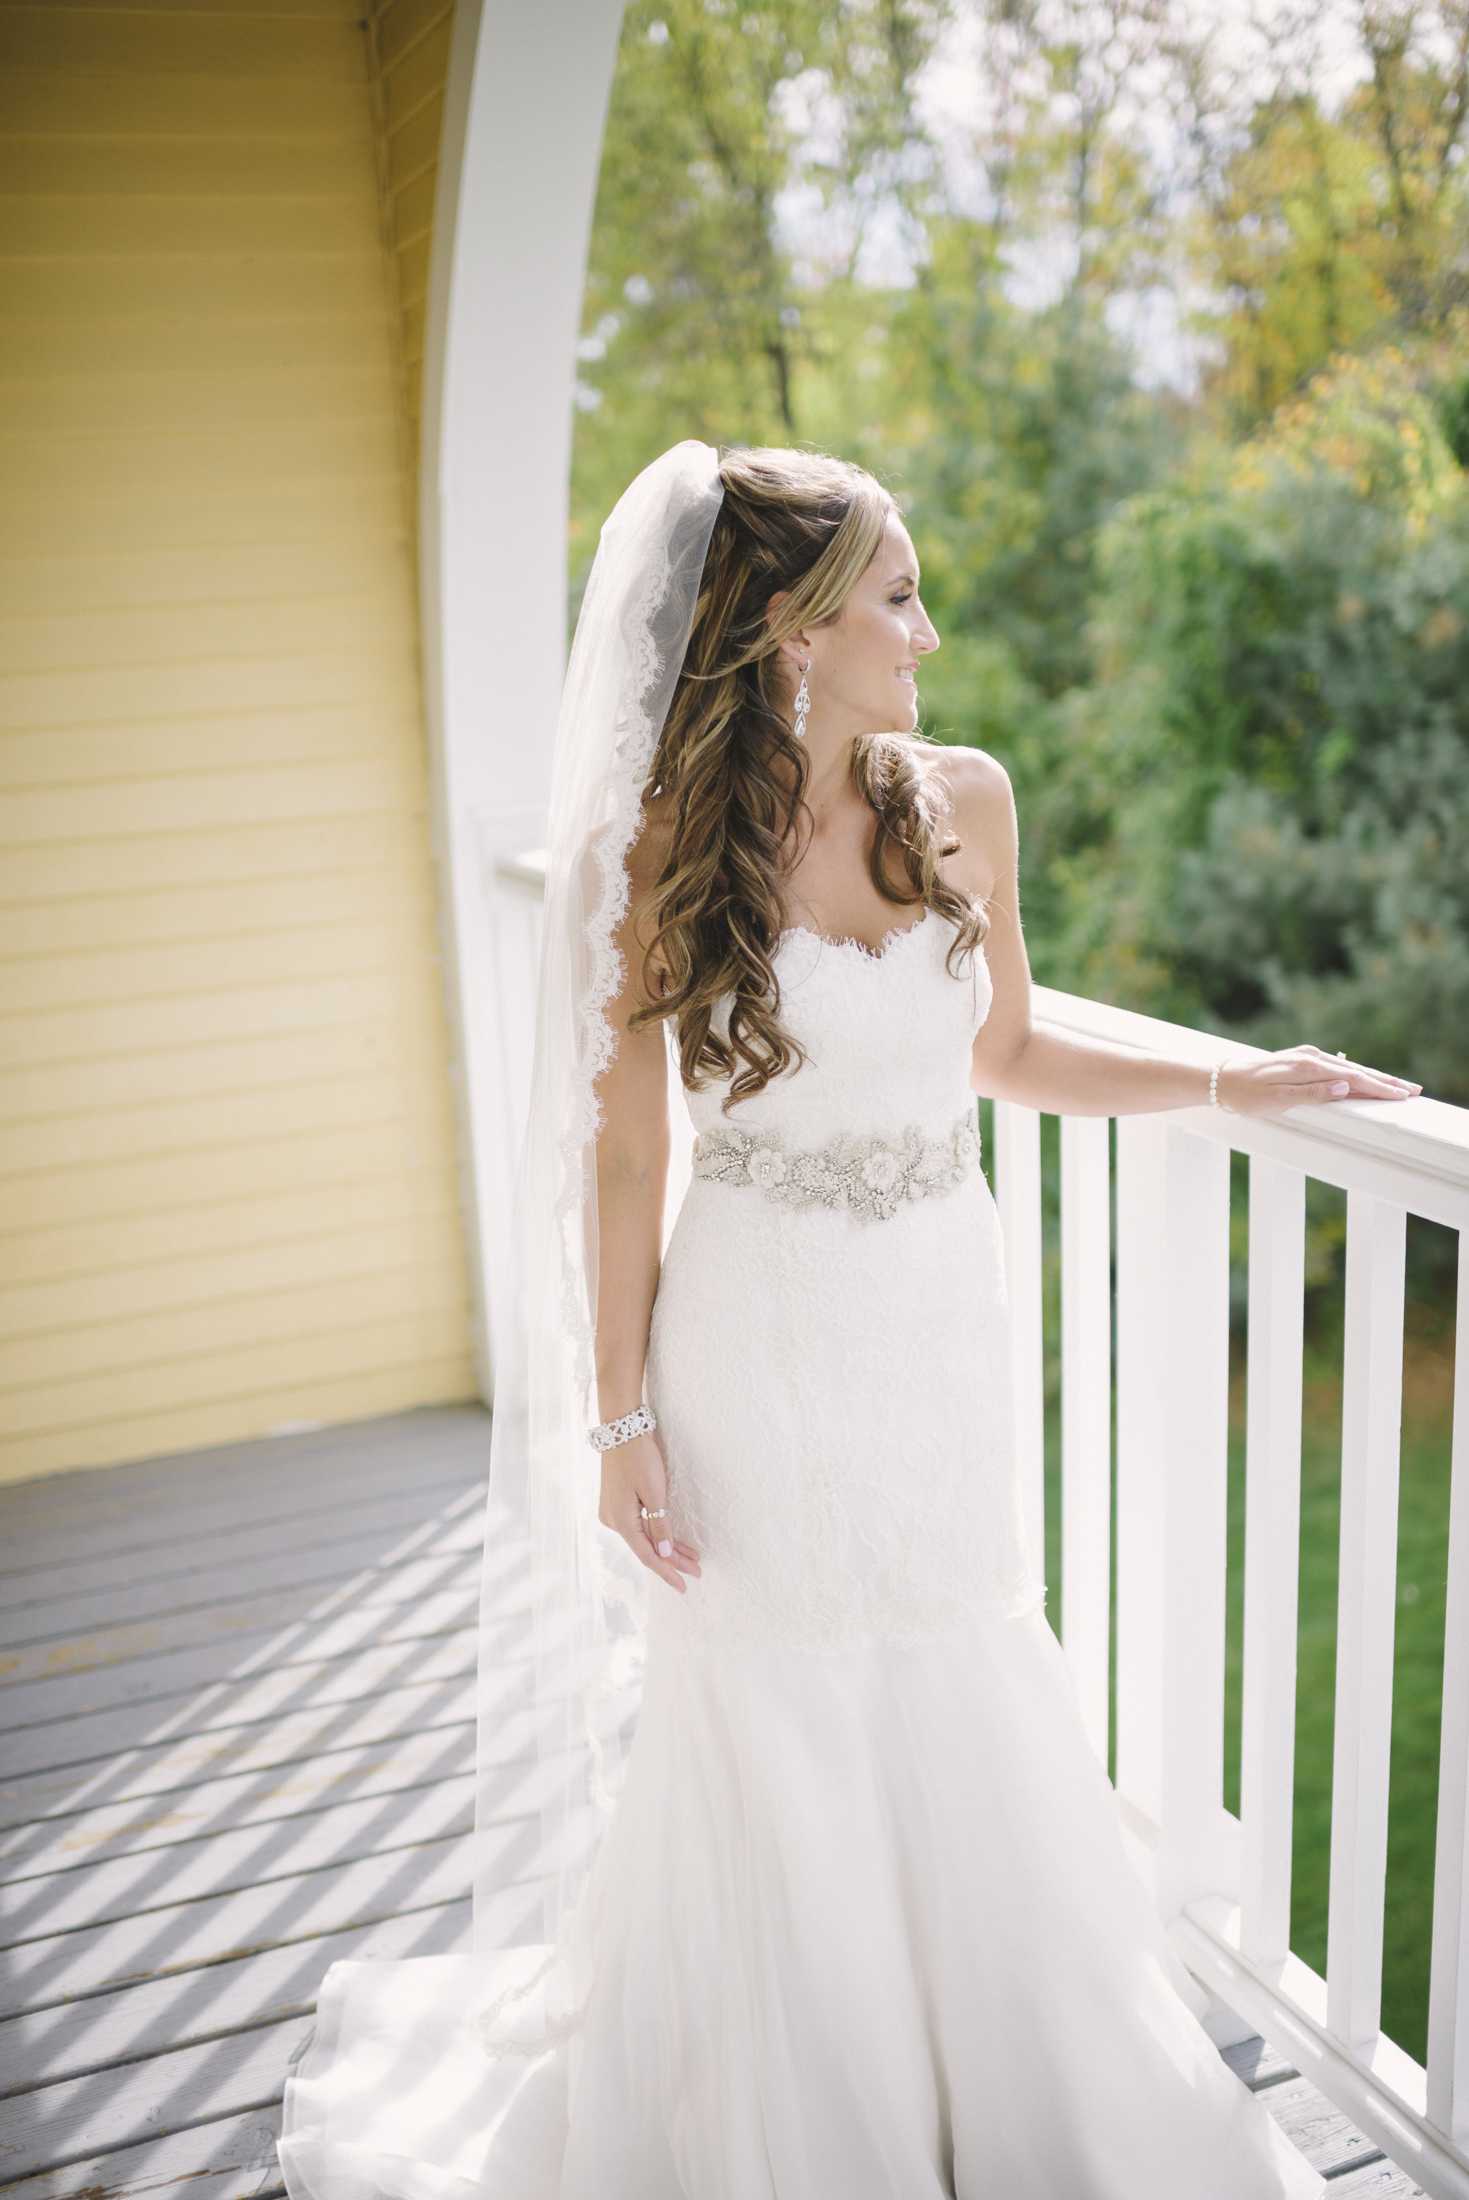 NH Wedding Photographer: Bedford Village Inn bride on balcony